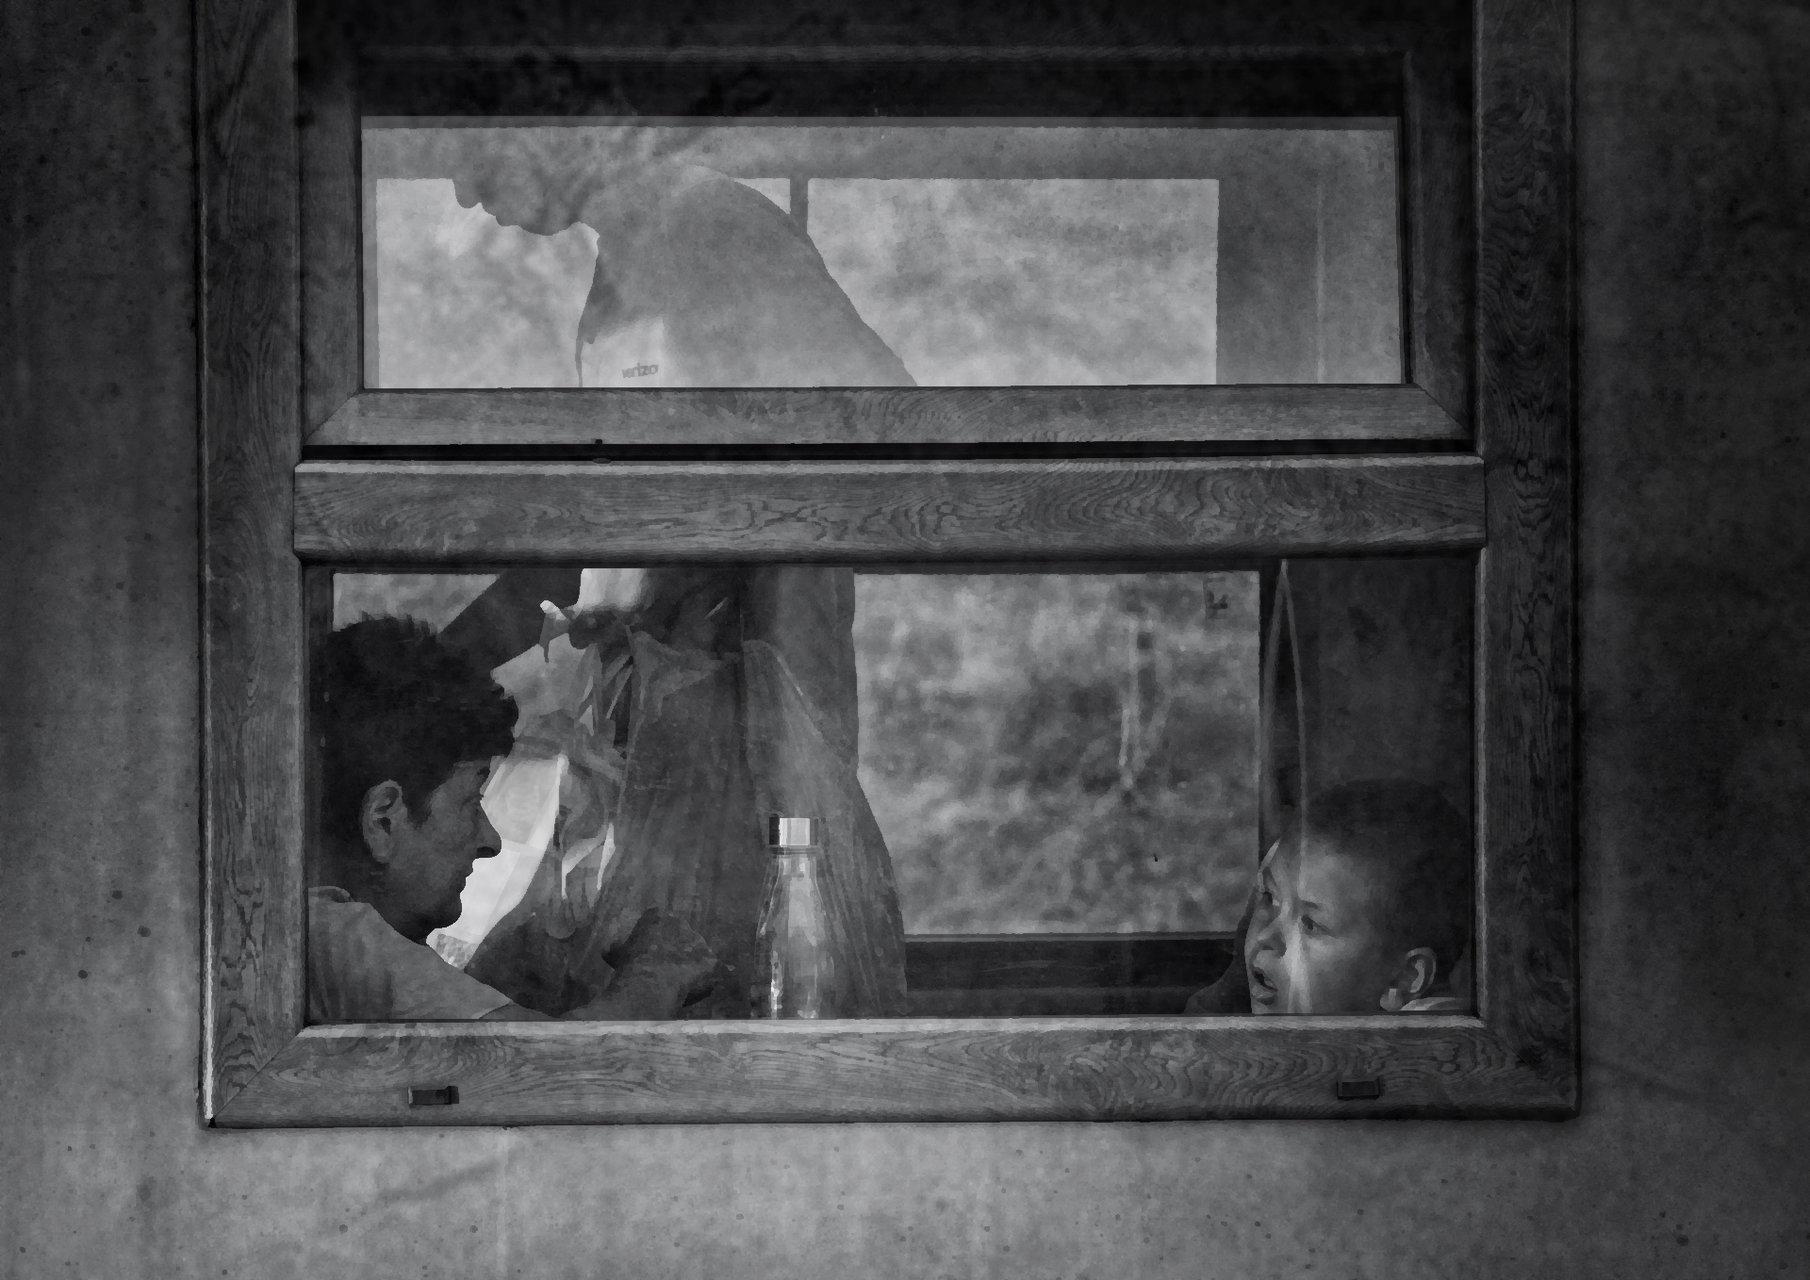 Photo in Daily round | Author Петя Лазарова - petial | PHOTO FORUM